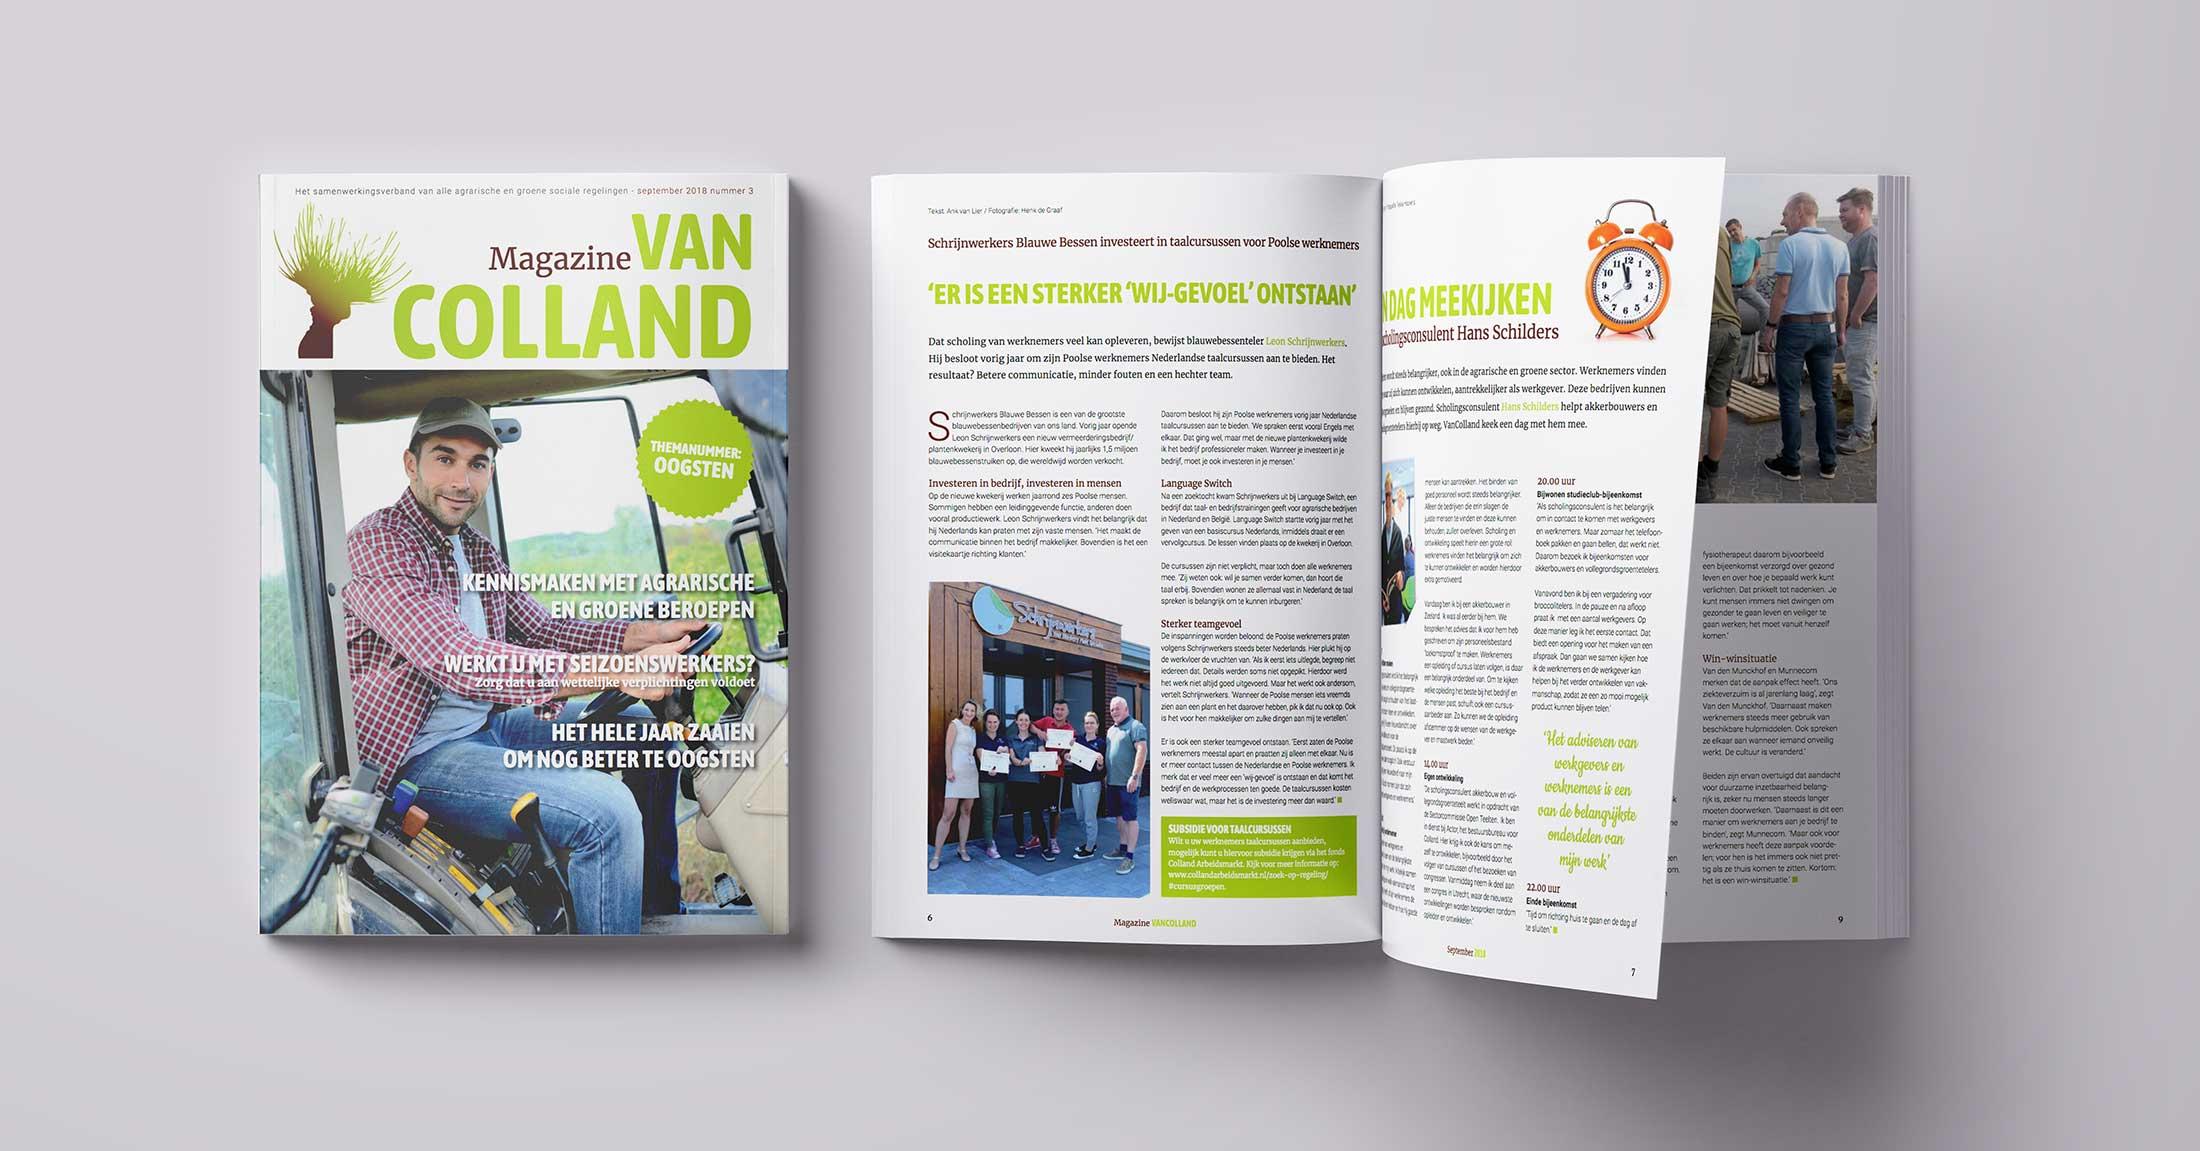 vancolland magazine language switch